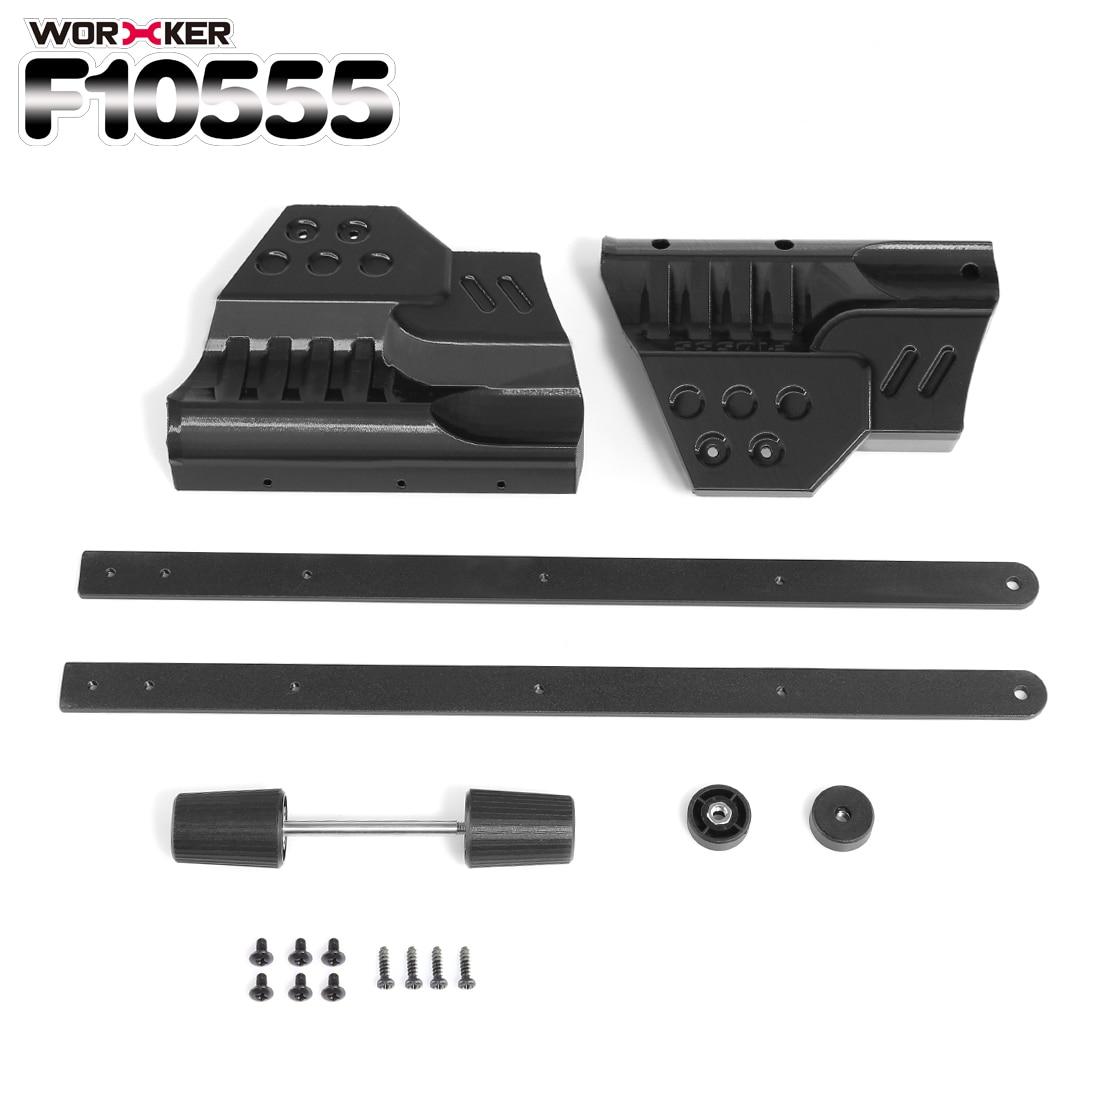 купить WORKER f10555 3D Printing Pull-down Kit for Nerf Zombie Strike ZED Squad Longshot CS-12 Blaster - Black по цене 1844.09 рублей